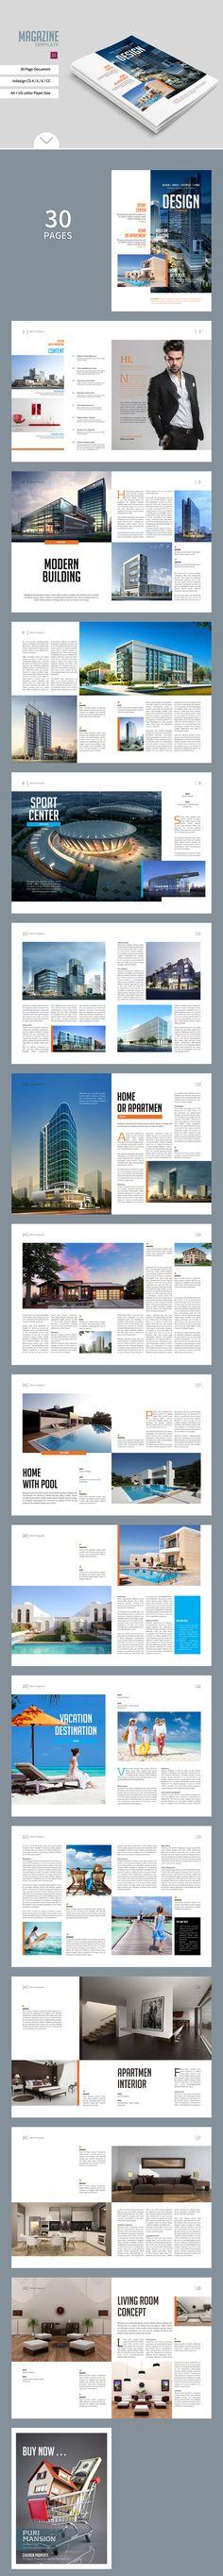 Simple Magazine Template by tujuhbenua on @creativemarket